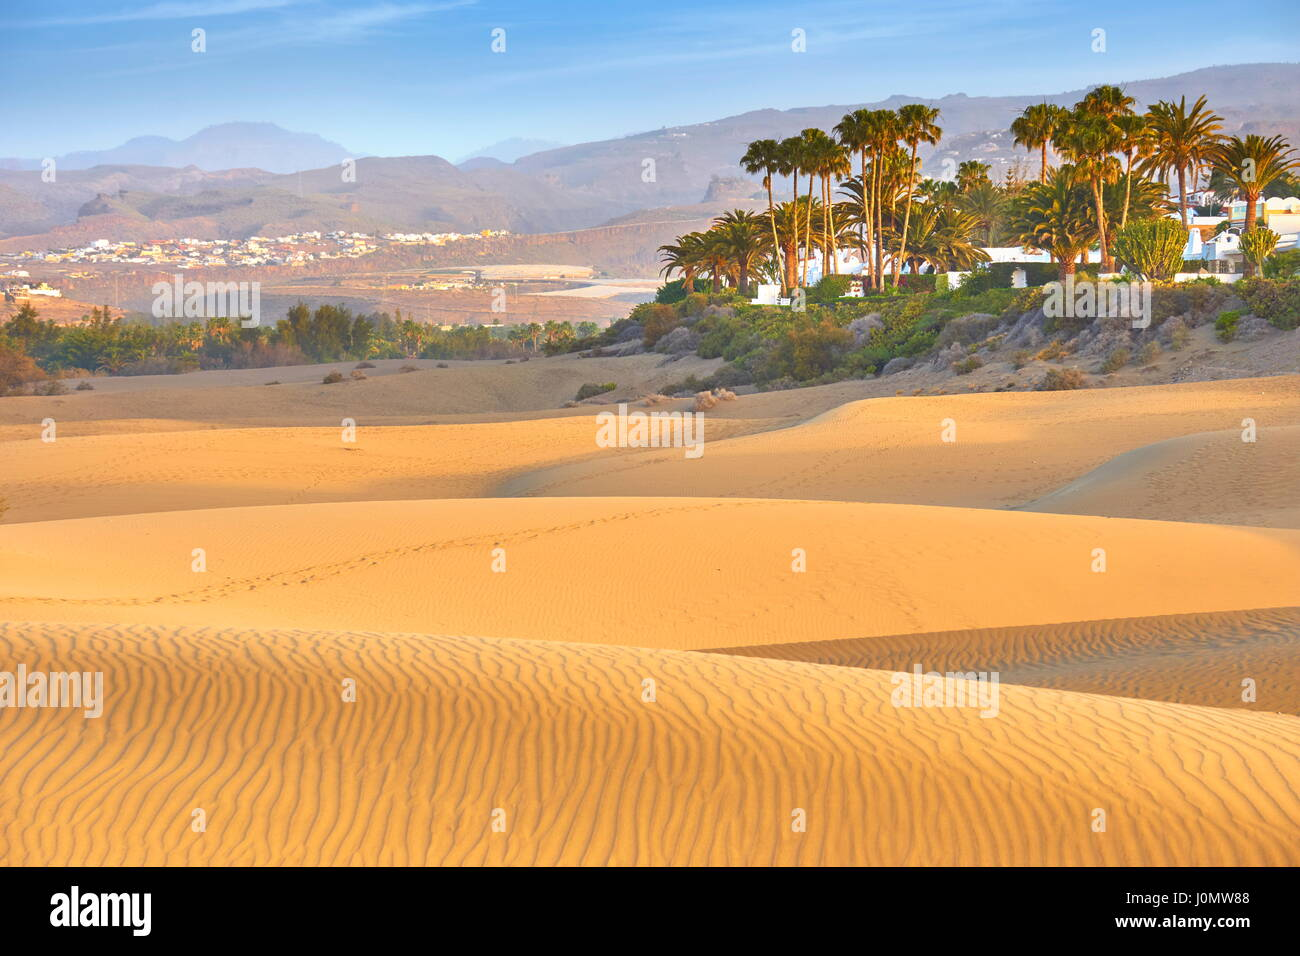 Maspalomas Sand Dunes, Gran Canaria, Spain - Stock Image